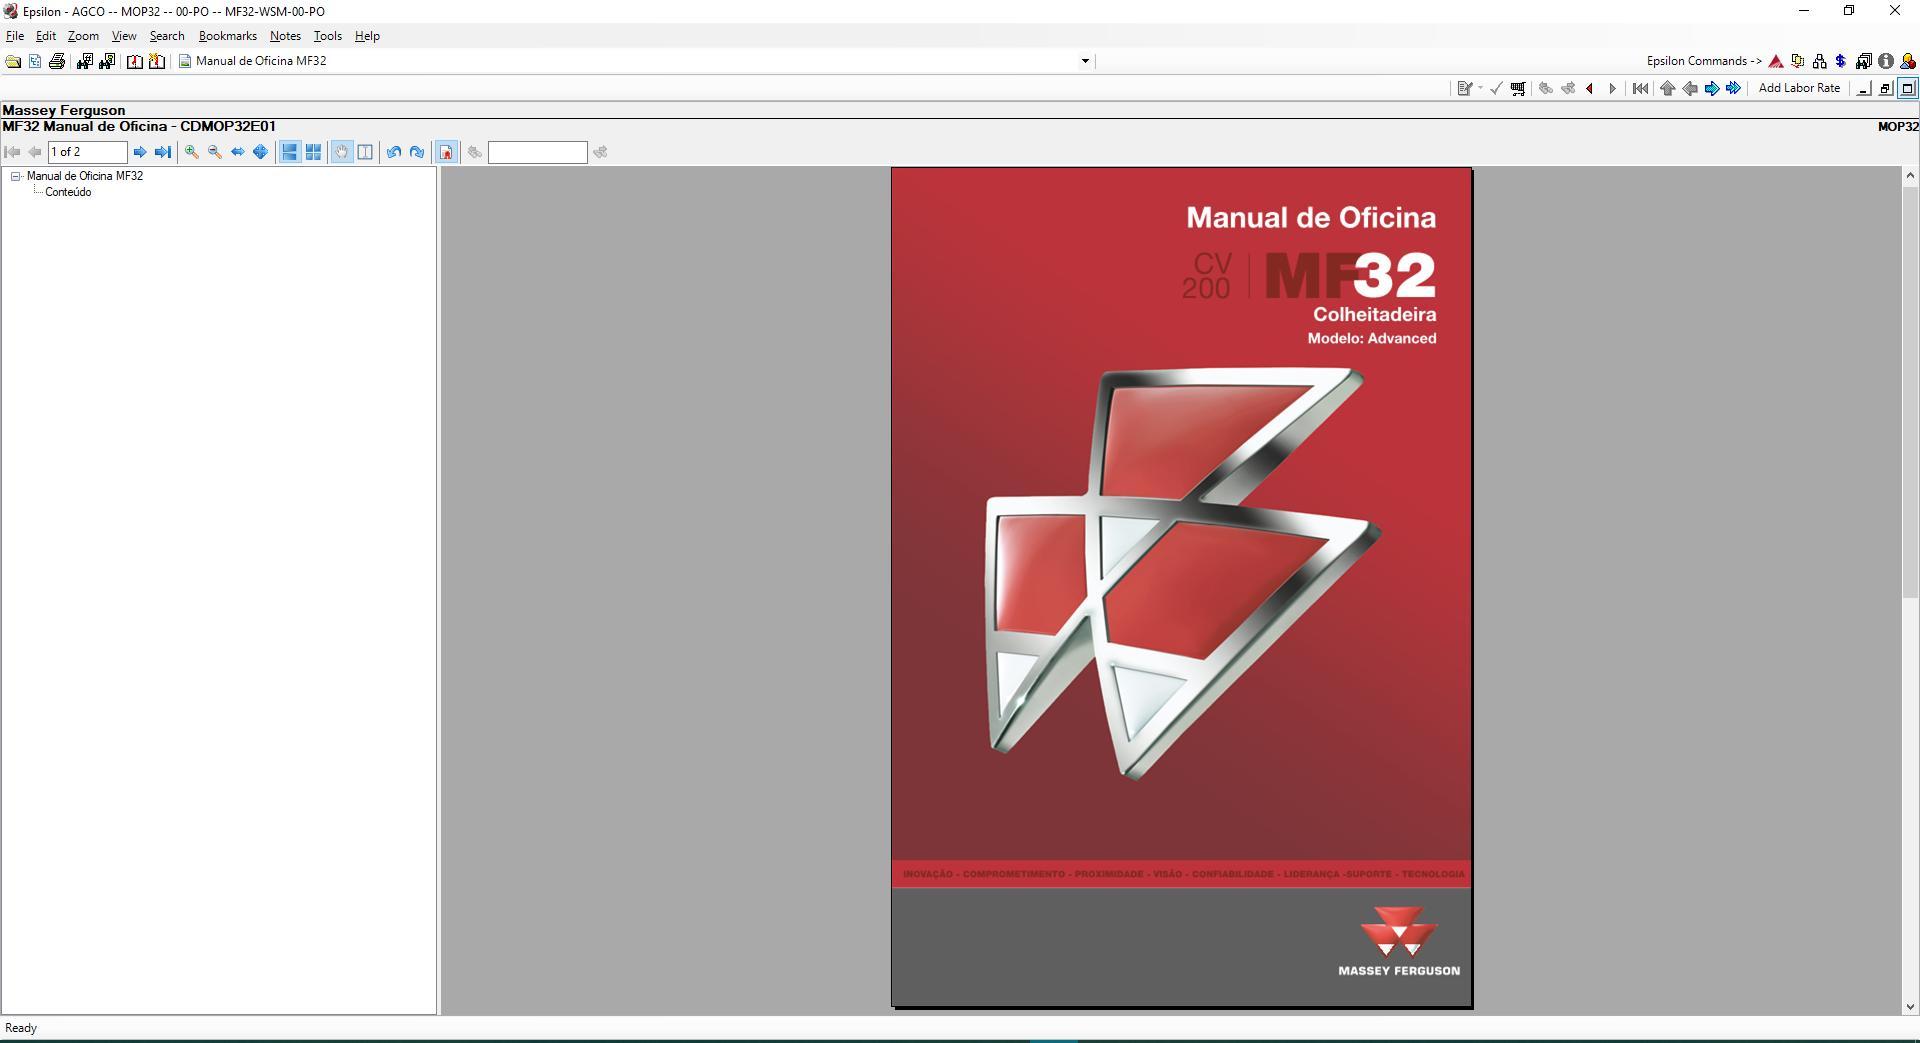 Massey_Ferguson_-_AG_Tractor_NA_Workshop_Service_Manuals_and_Service_Bulletins_0520198